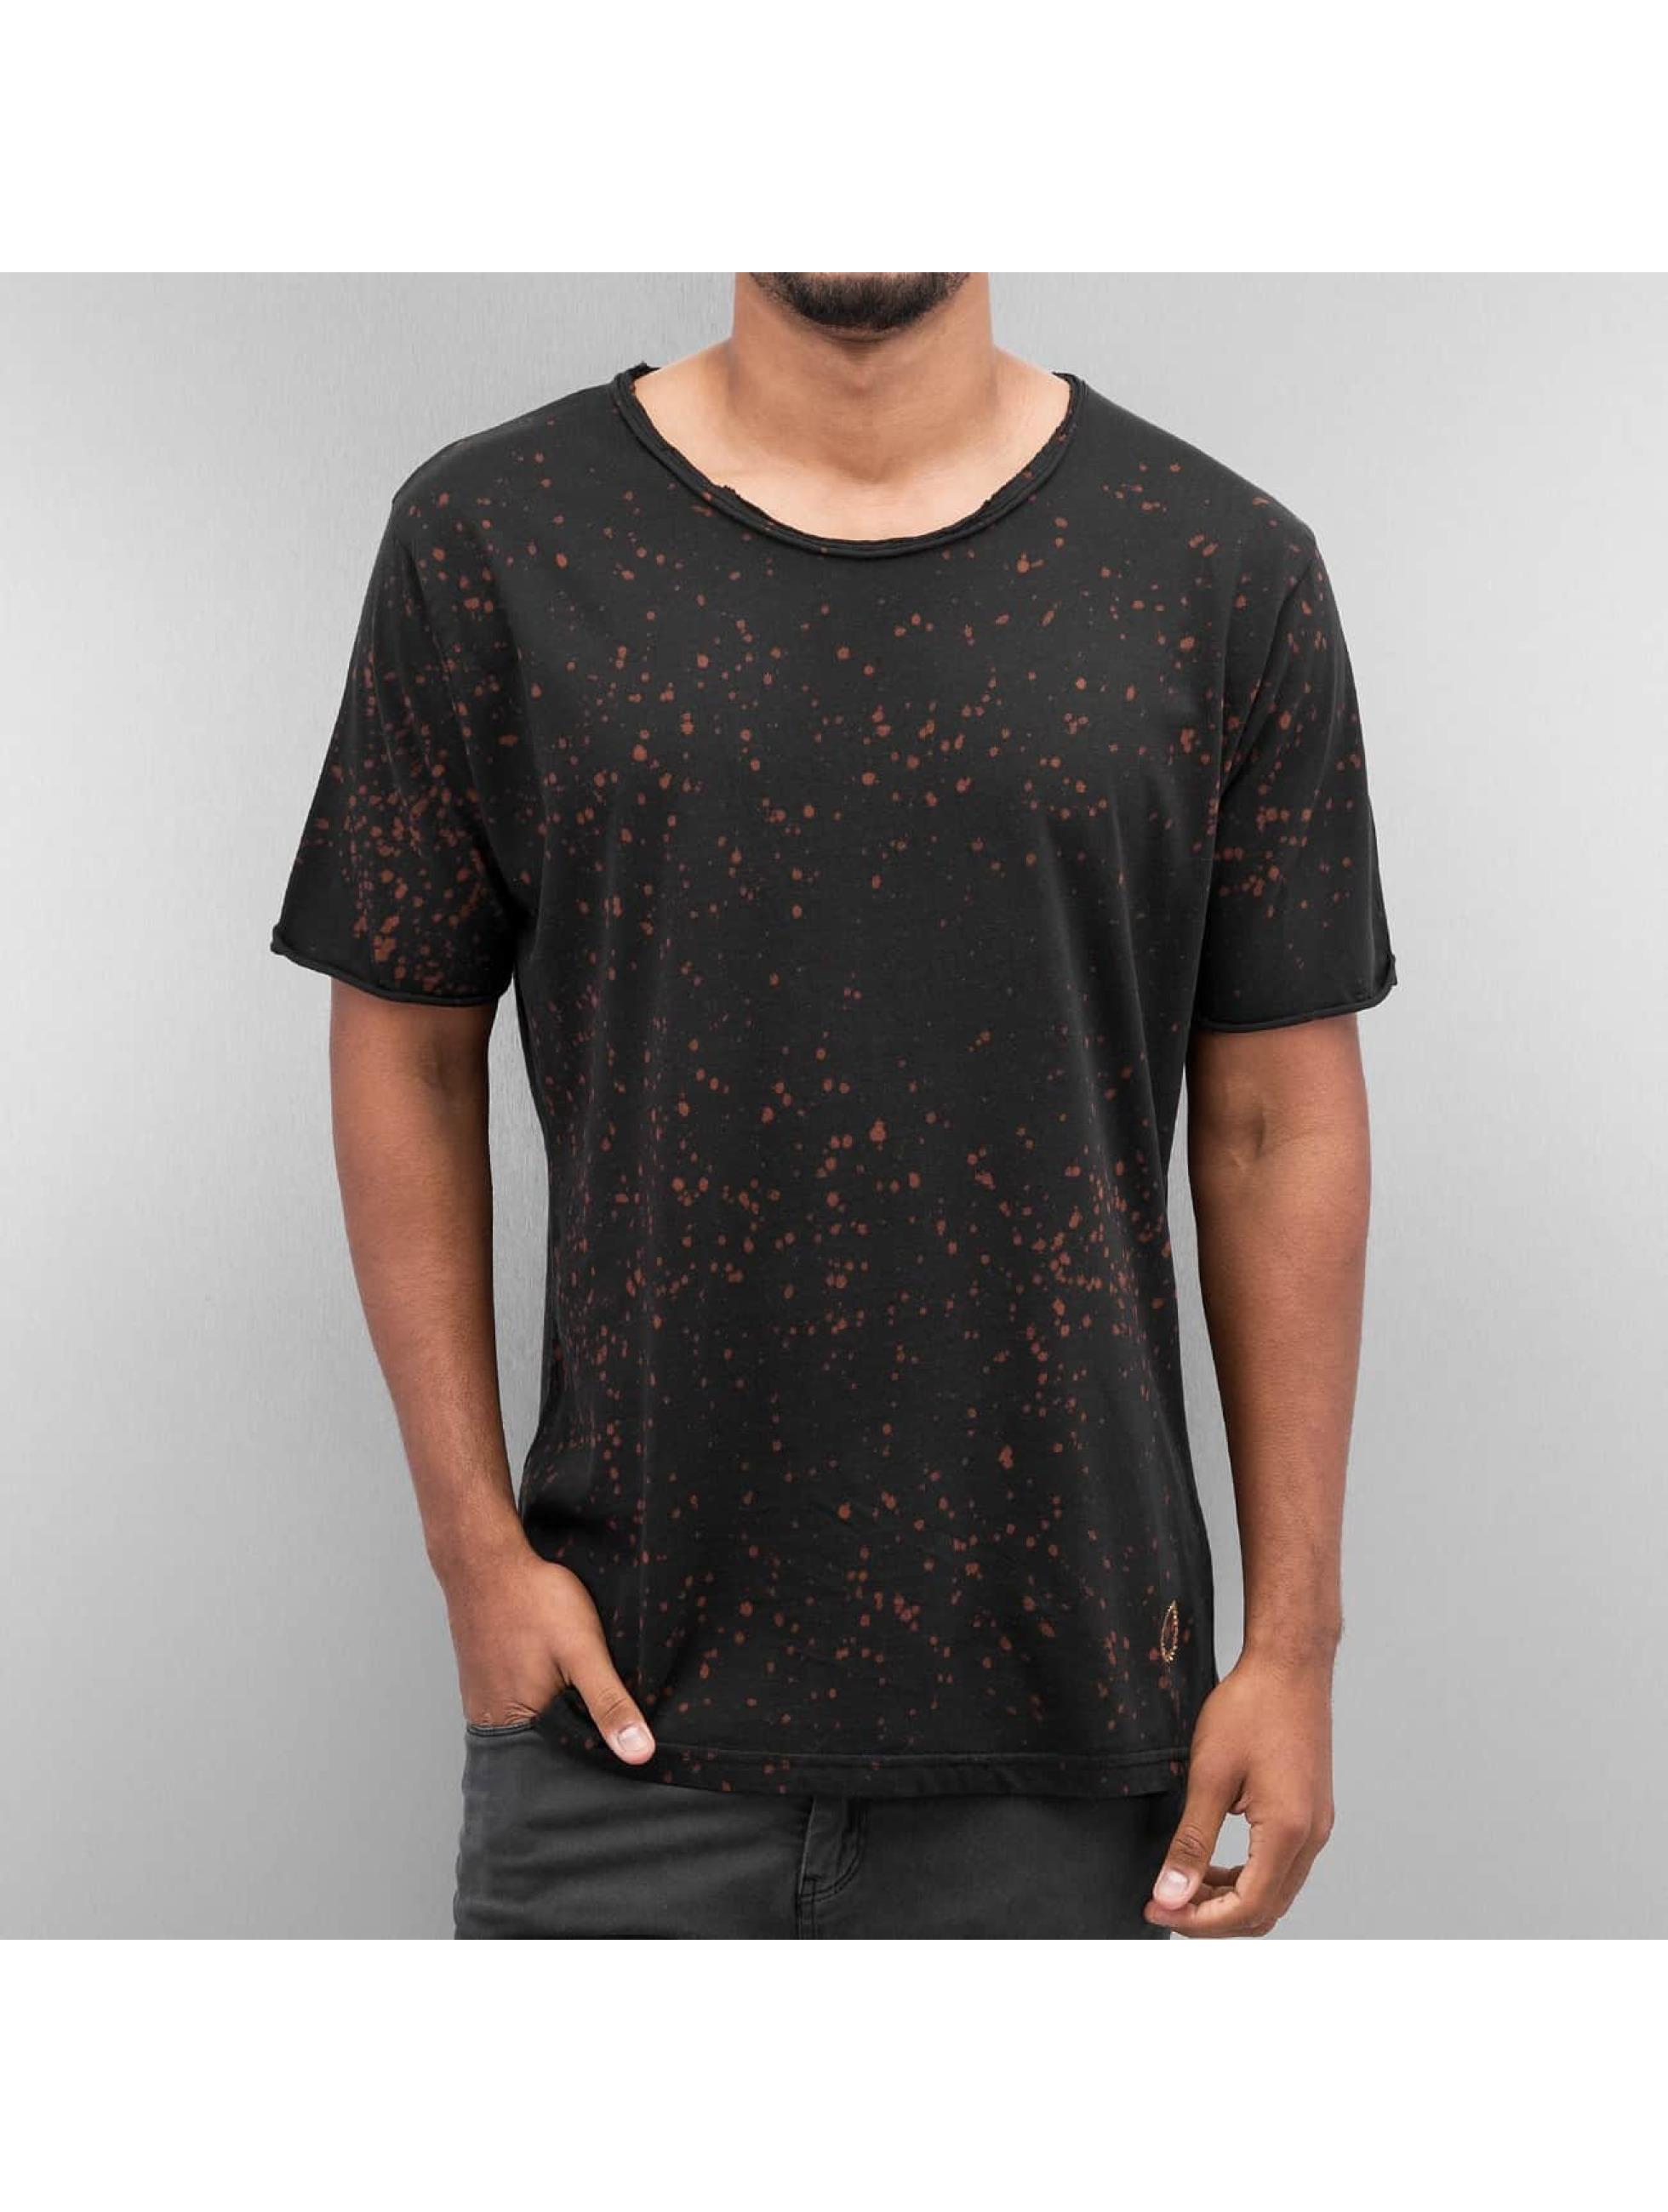 Yezz T-Shirt Dots schwarz